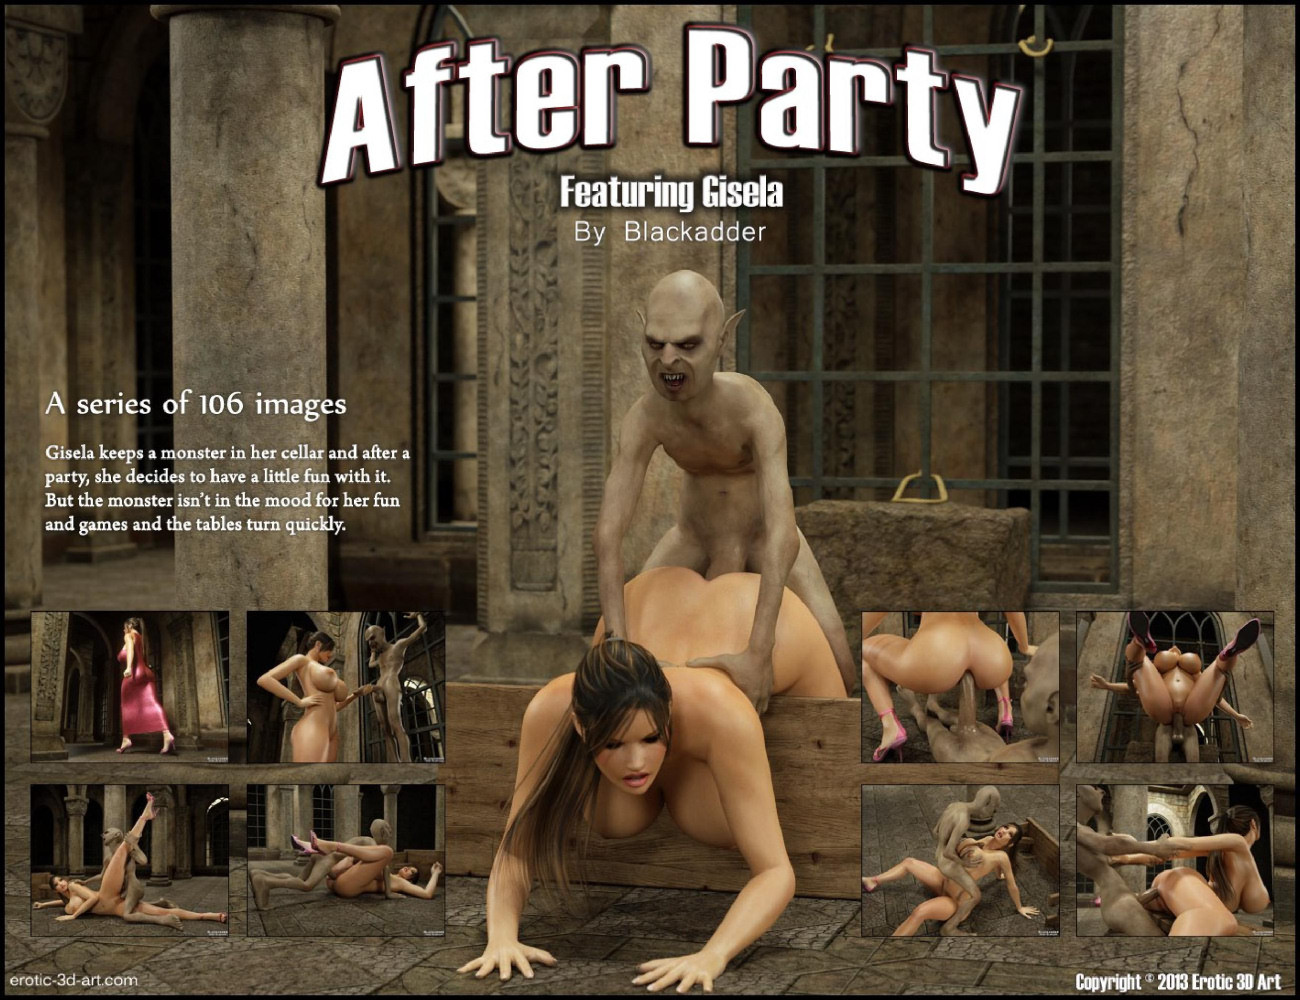 After Party – Blackadder image 1